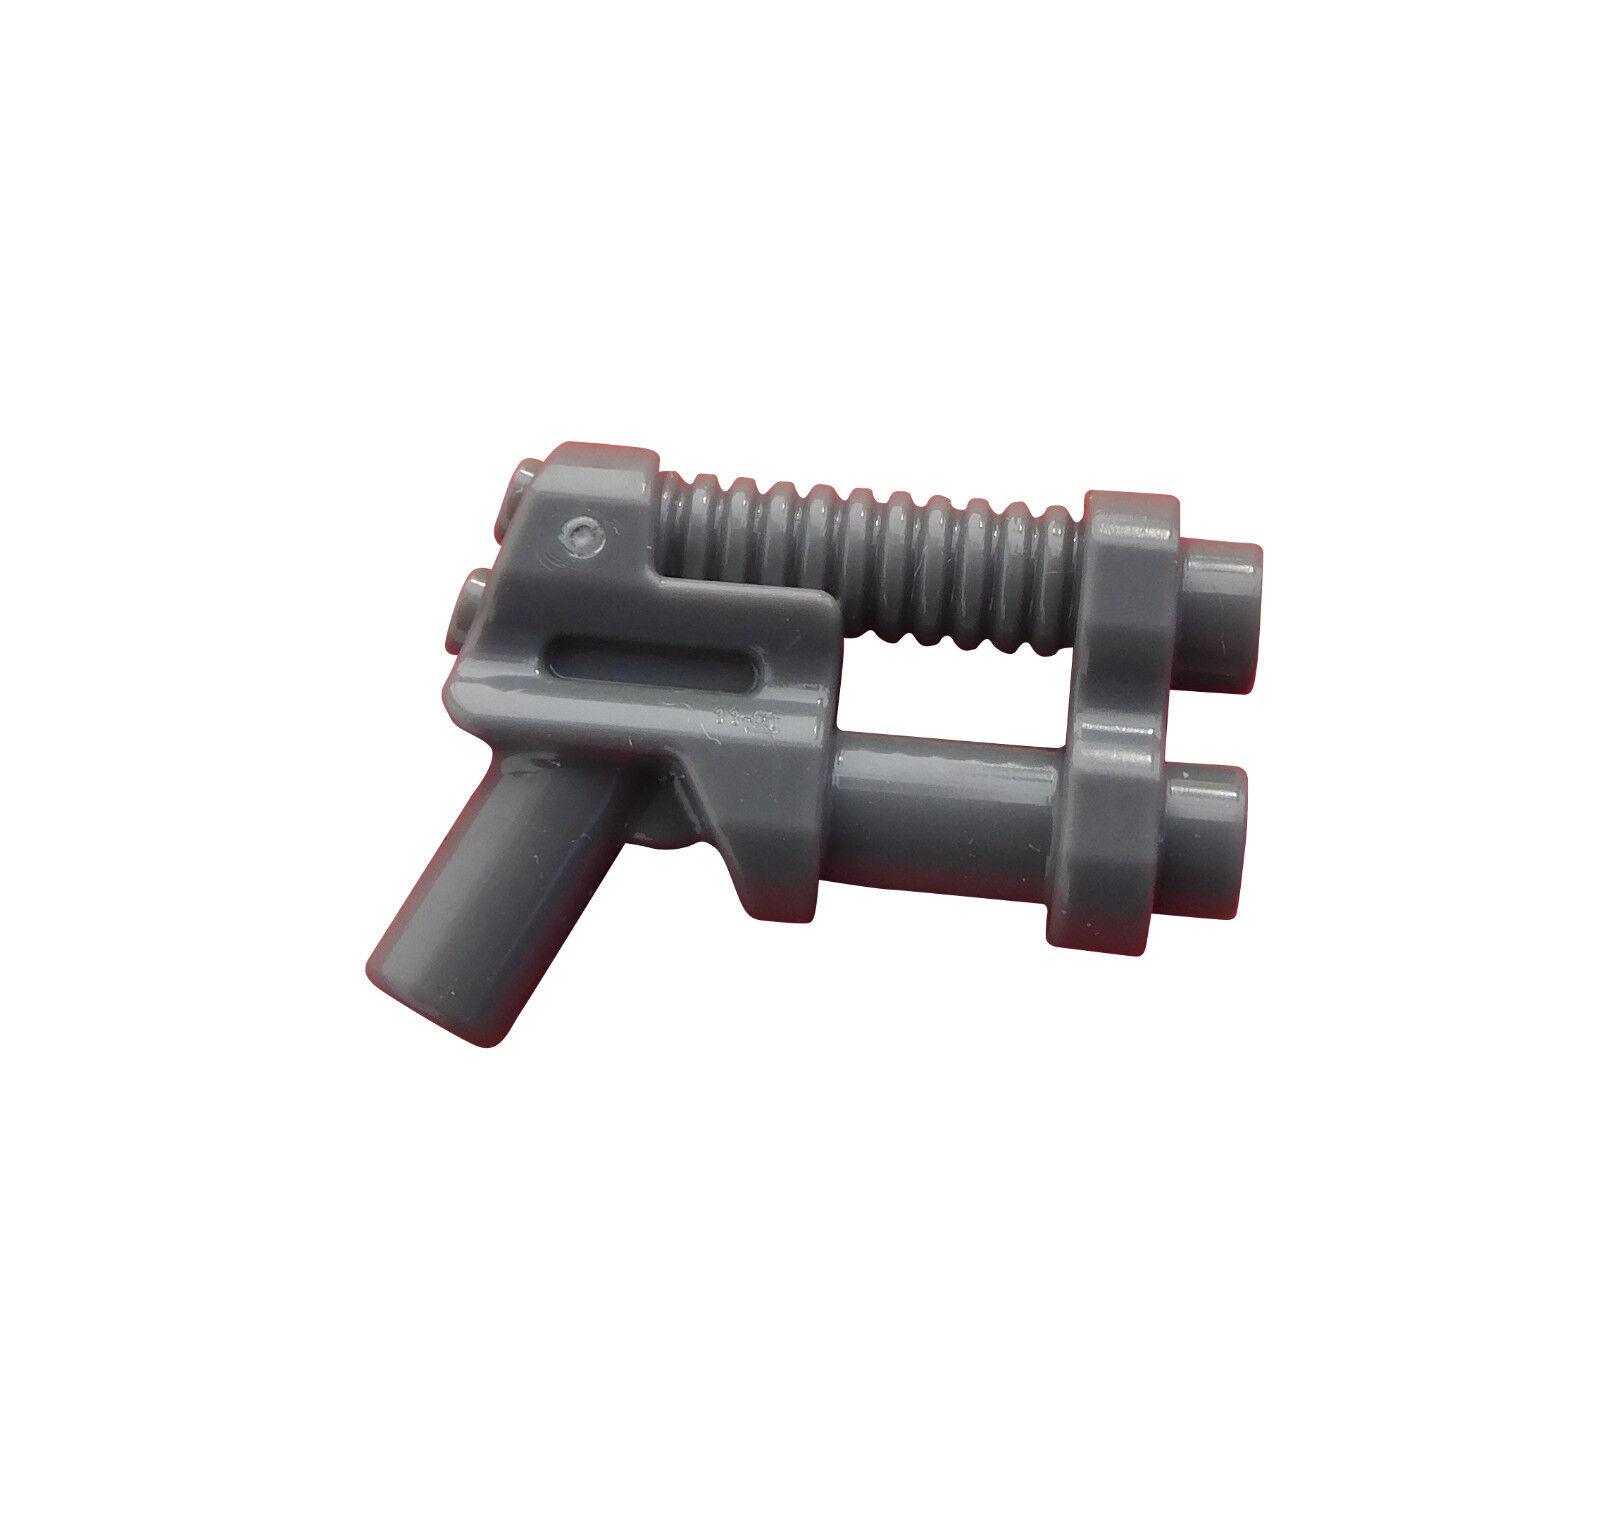 Lego 10 dunkelgraue Blaster Waffen dark bluish gray Two Barrel Pistol 95199 Neu